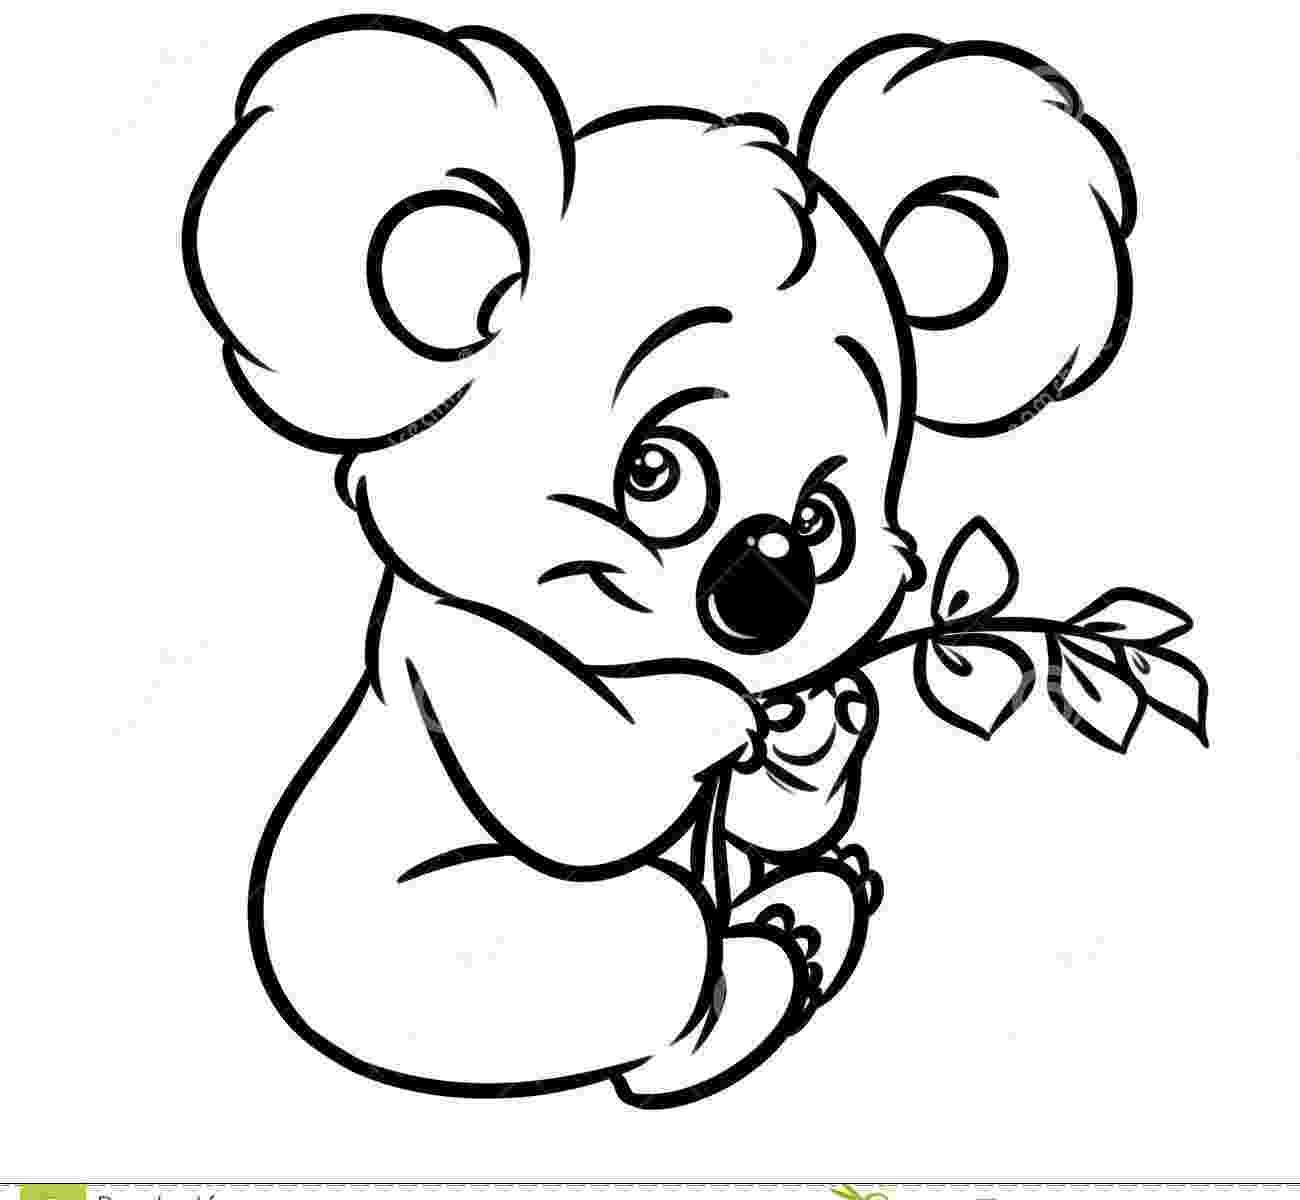 koala coloring pages koala coloring pages for kids hop a ride with a koala coloring pages koala